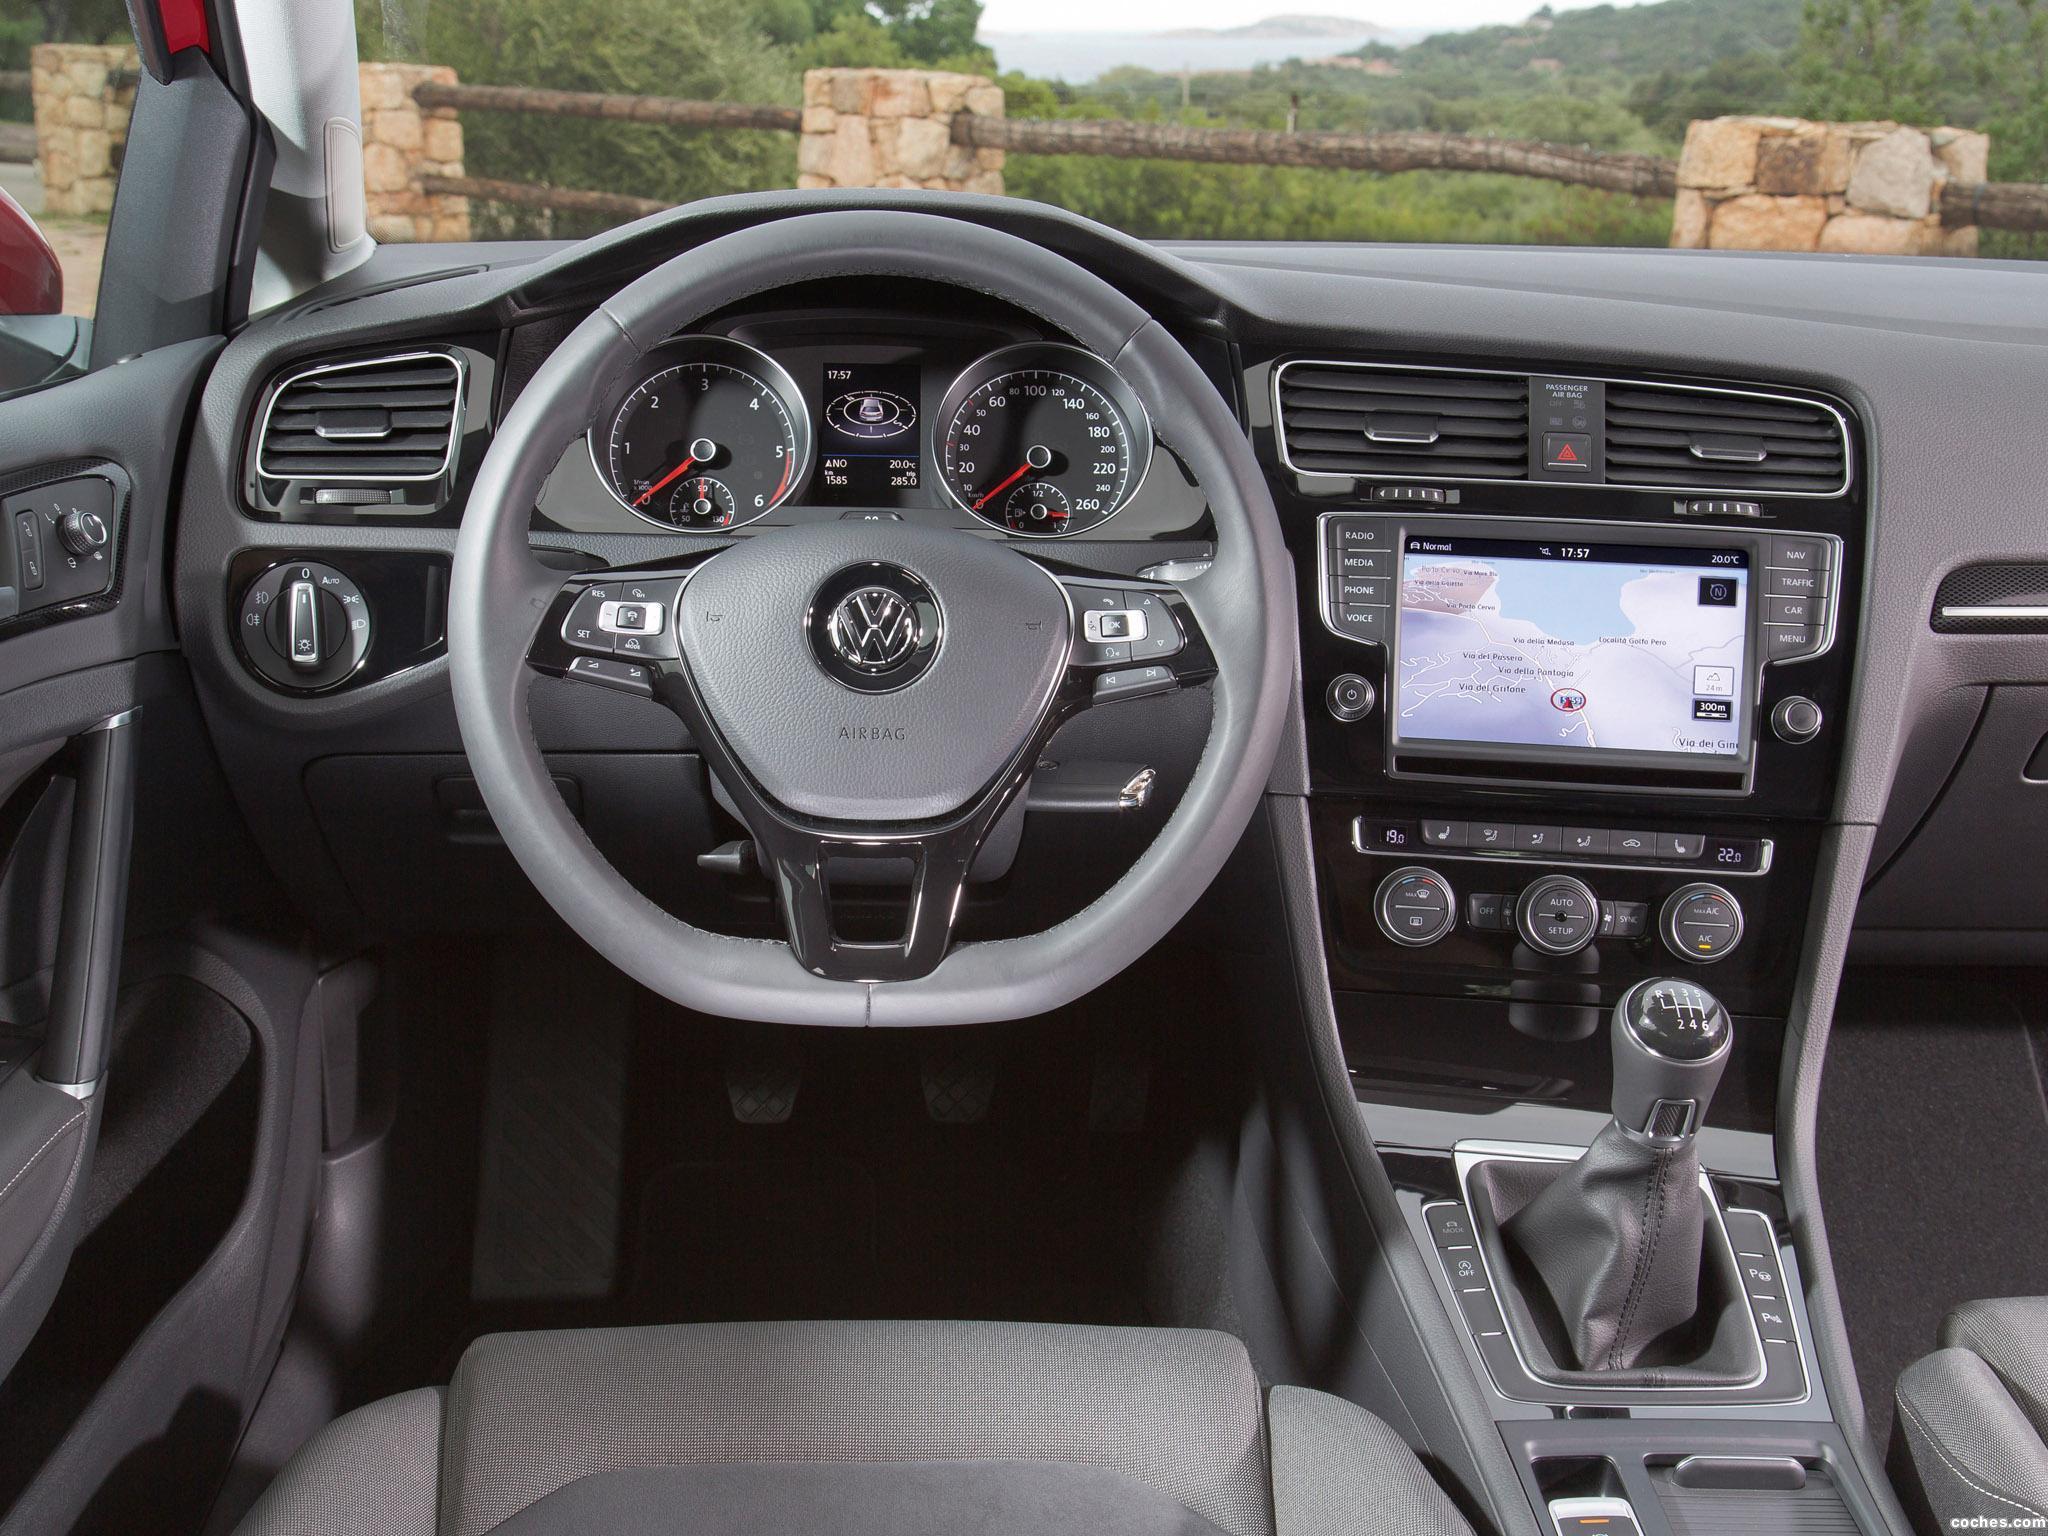 Foto 9 de Volkswagen Golf 7 5 puertas 2.0 TDI BlueMotion 2013